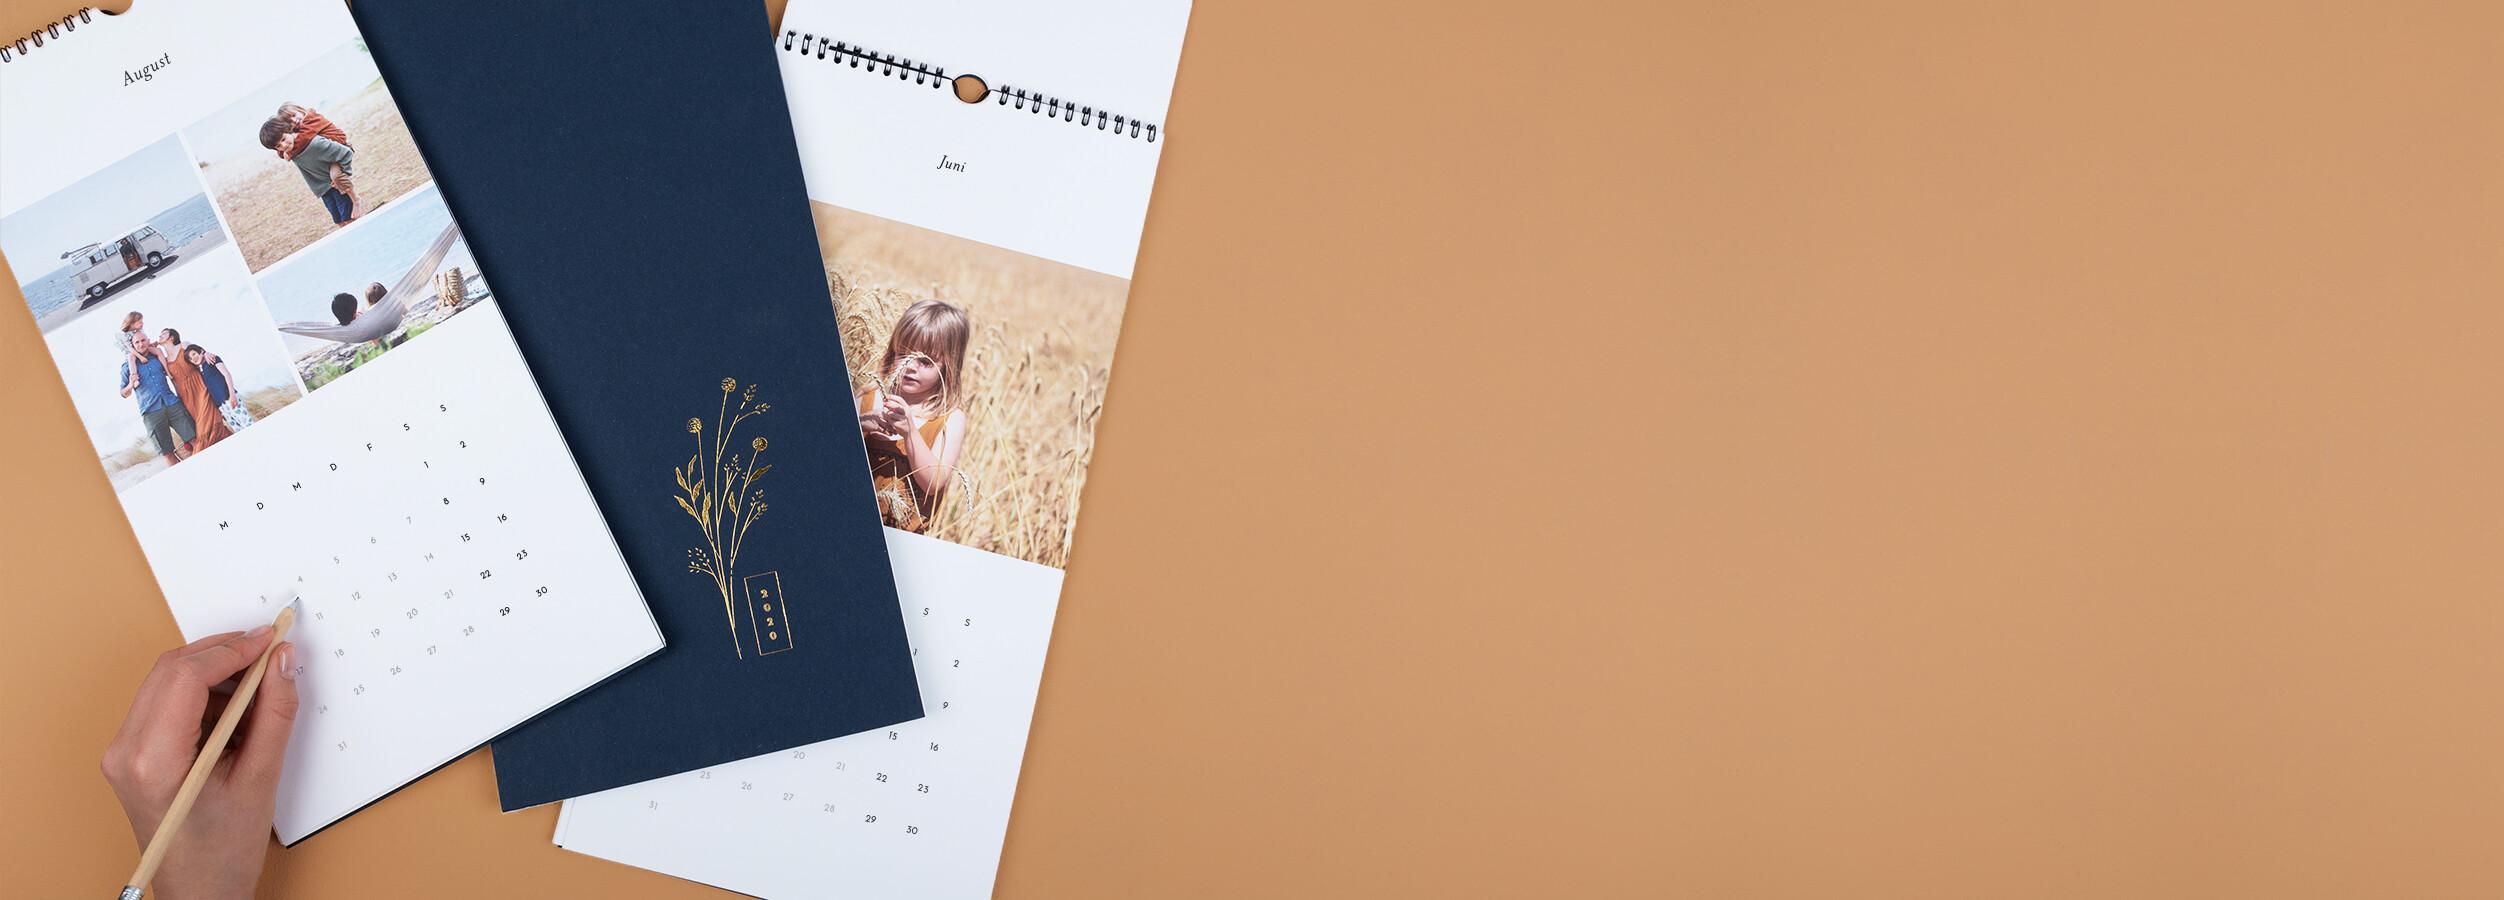 Personalisierbare Fotokalender